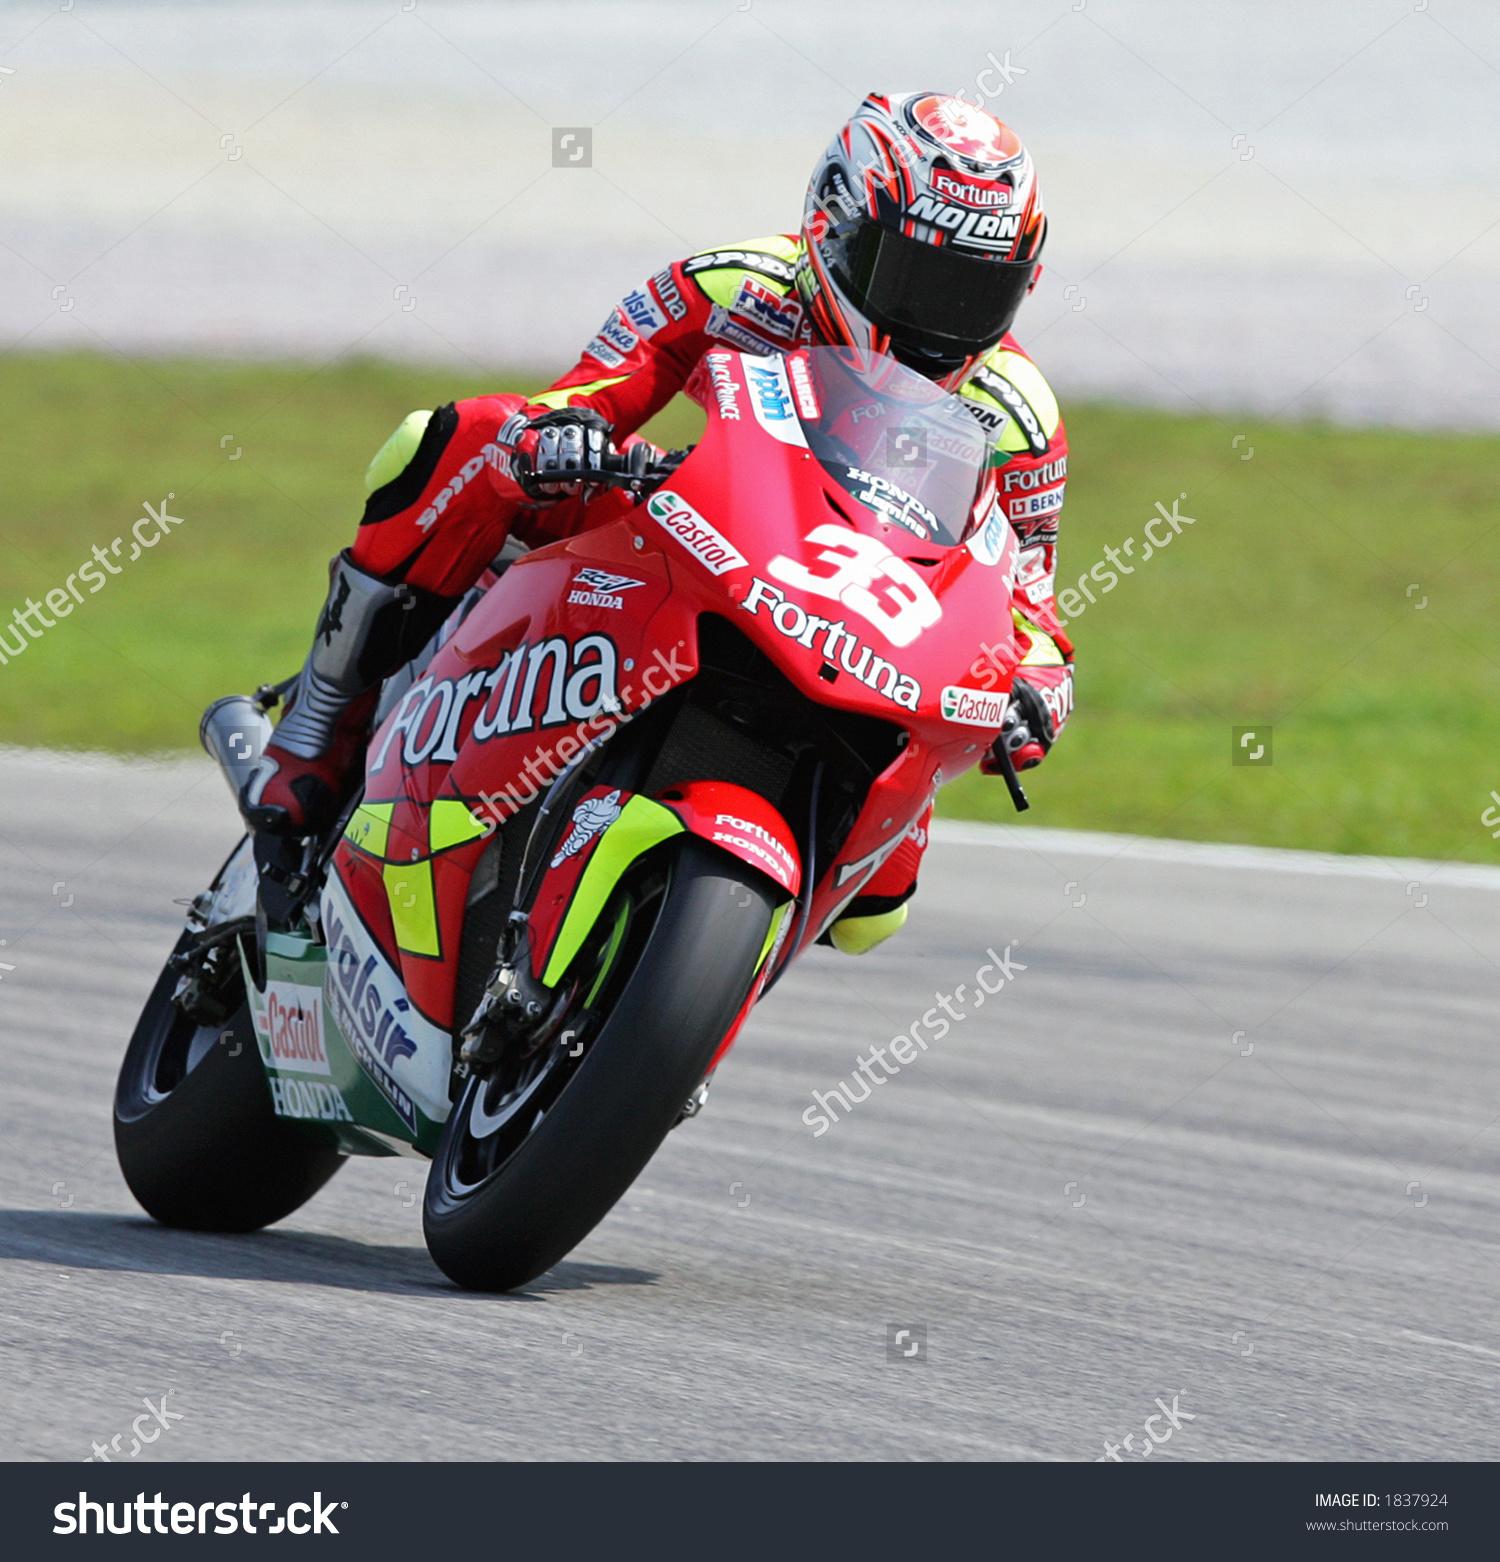 Italian Motogp Rider Marco Melandri Fortuna Stock Photo 1837924.